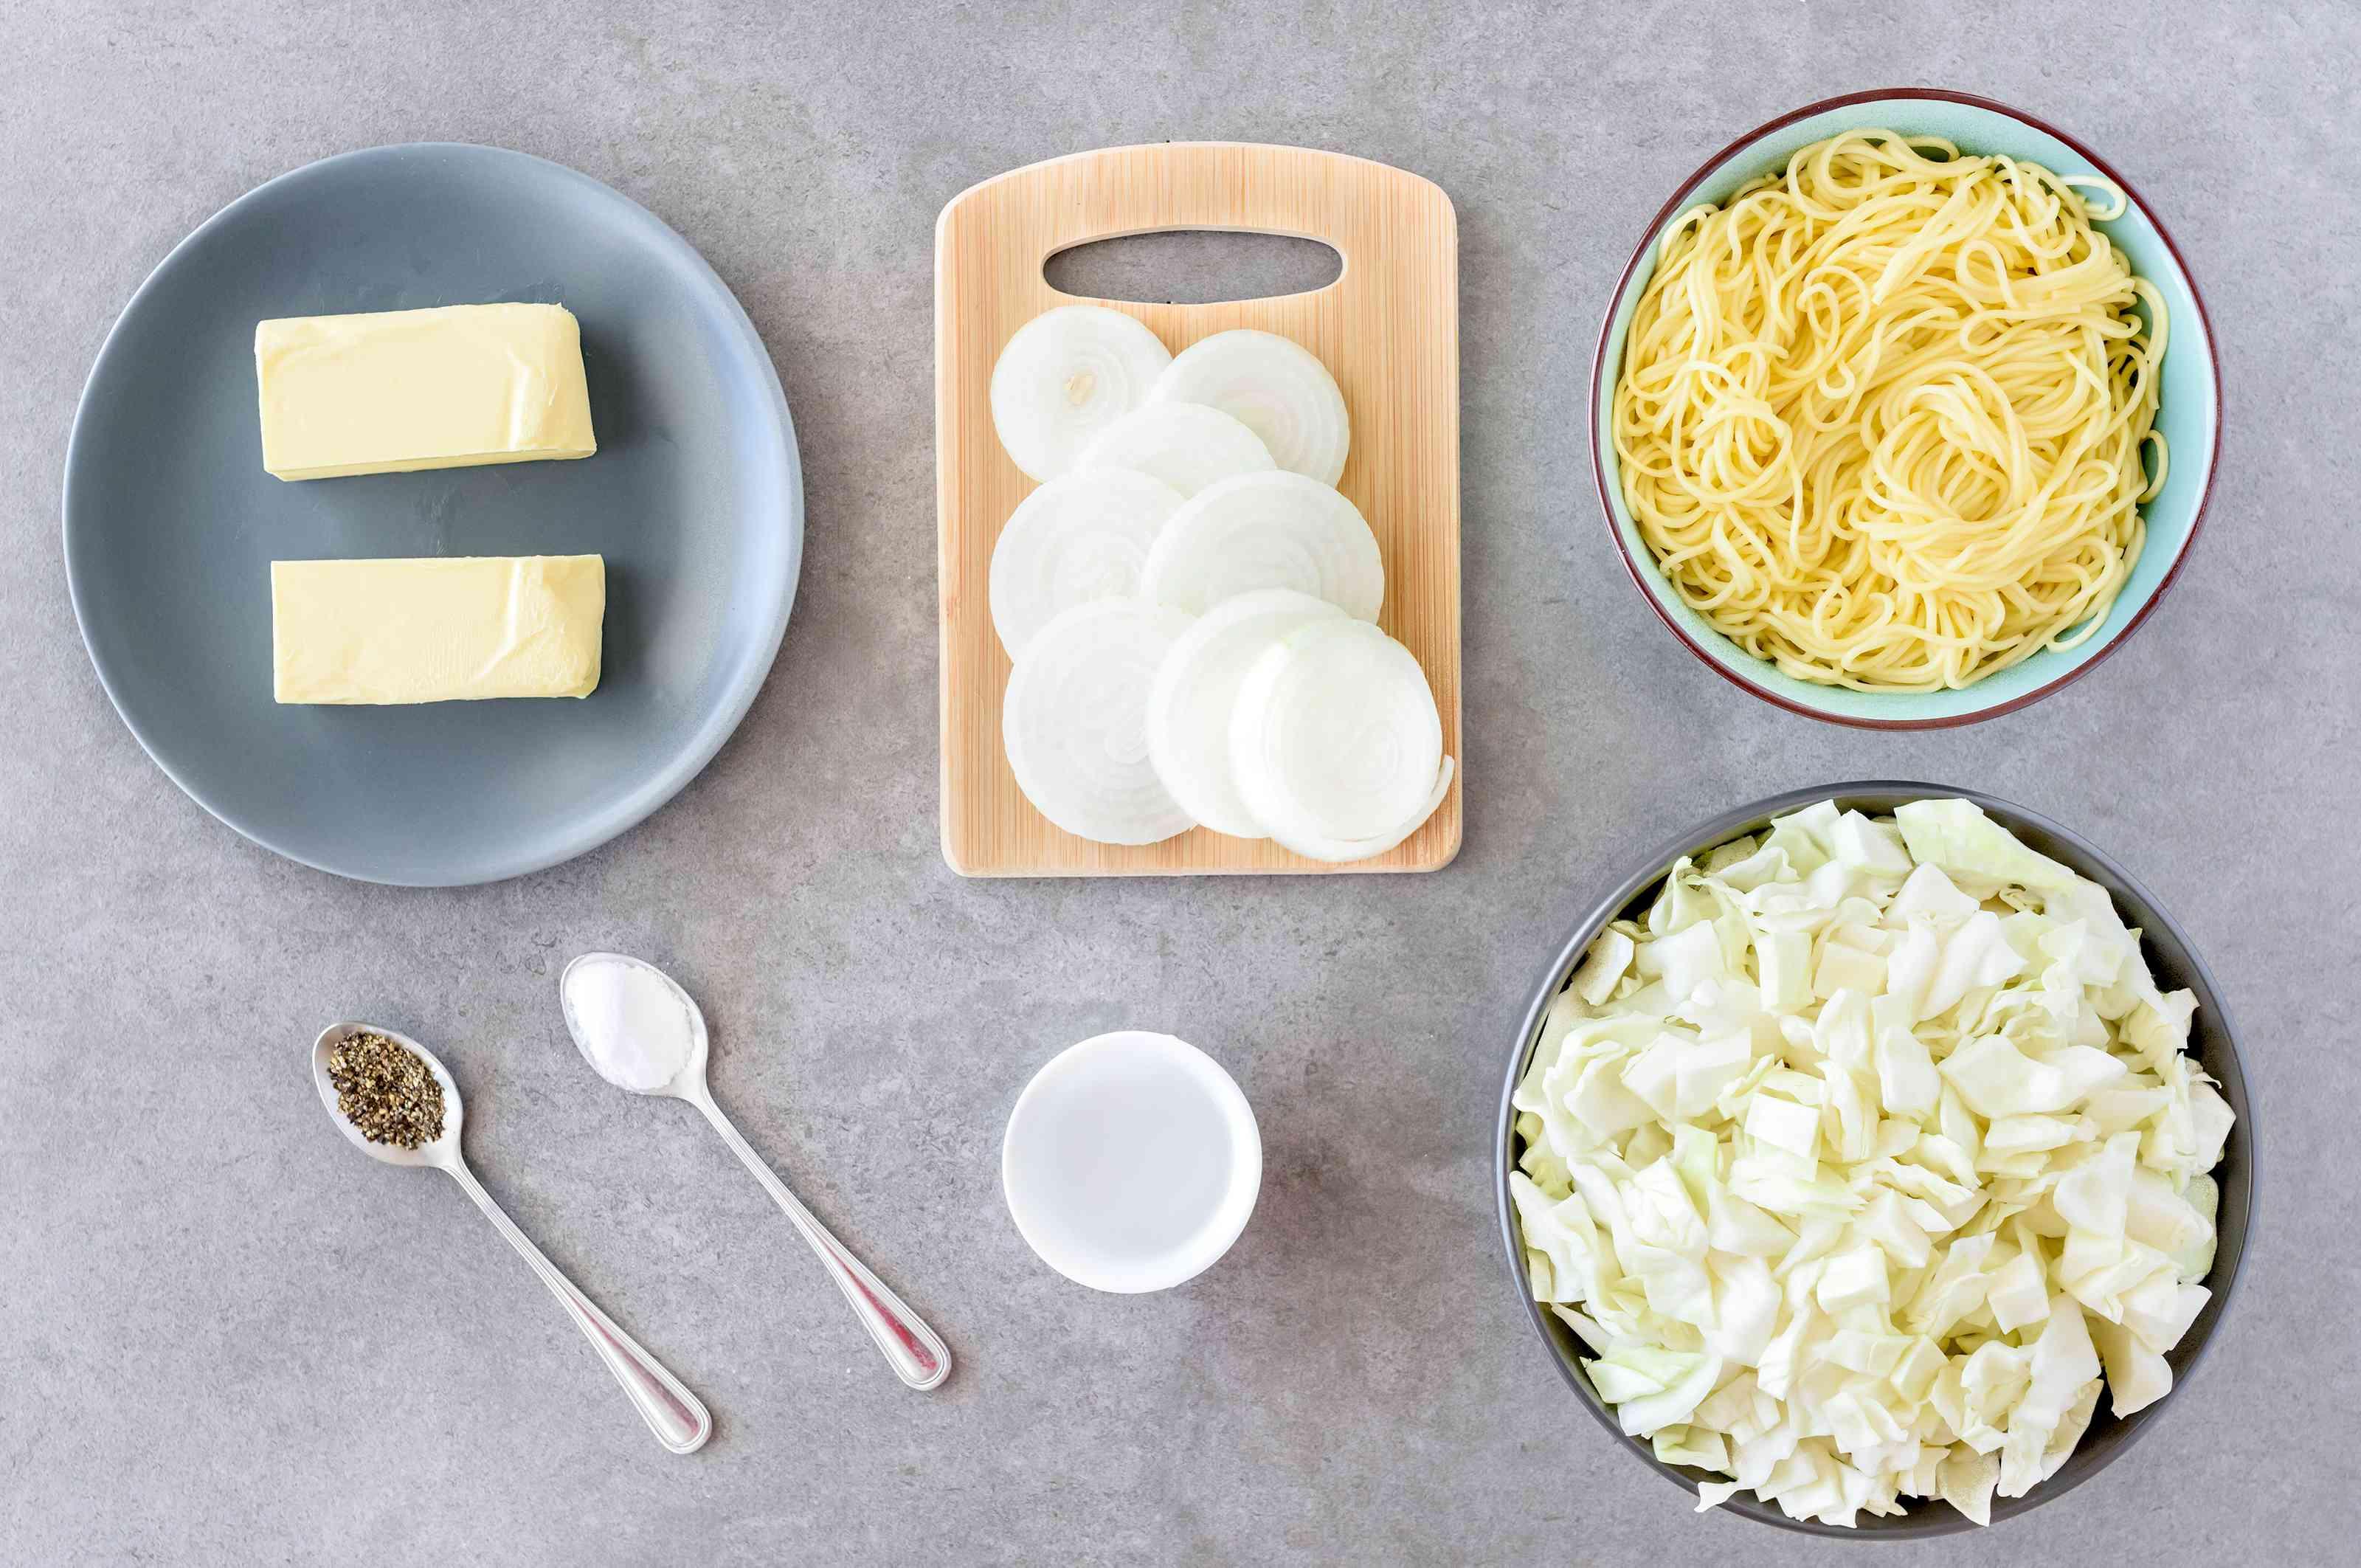 Ingredients for Polish hałuski noodles onion cabbage recipe